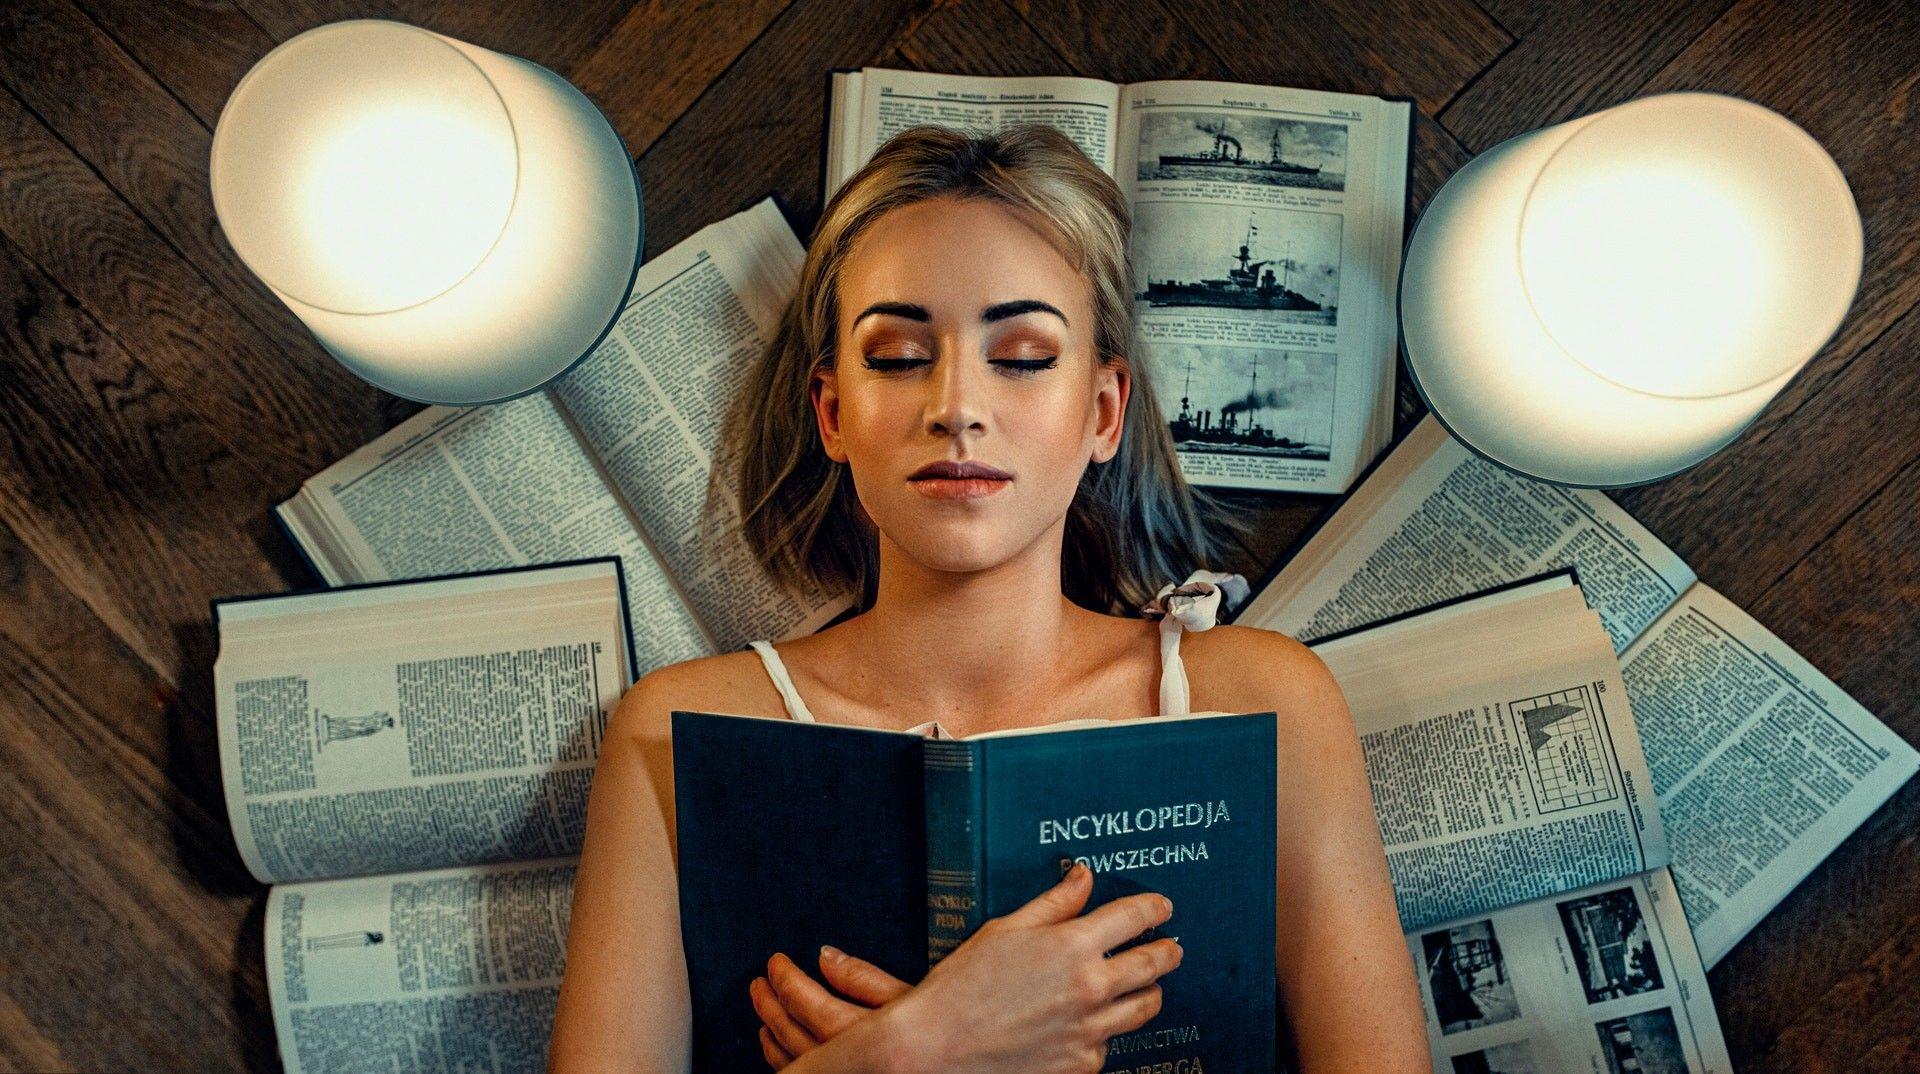 Wallpaper Aleksandra Wacyra reading books